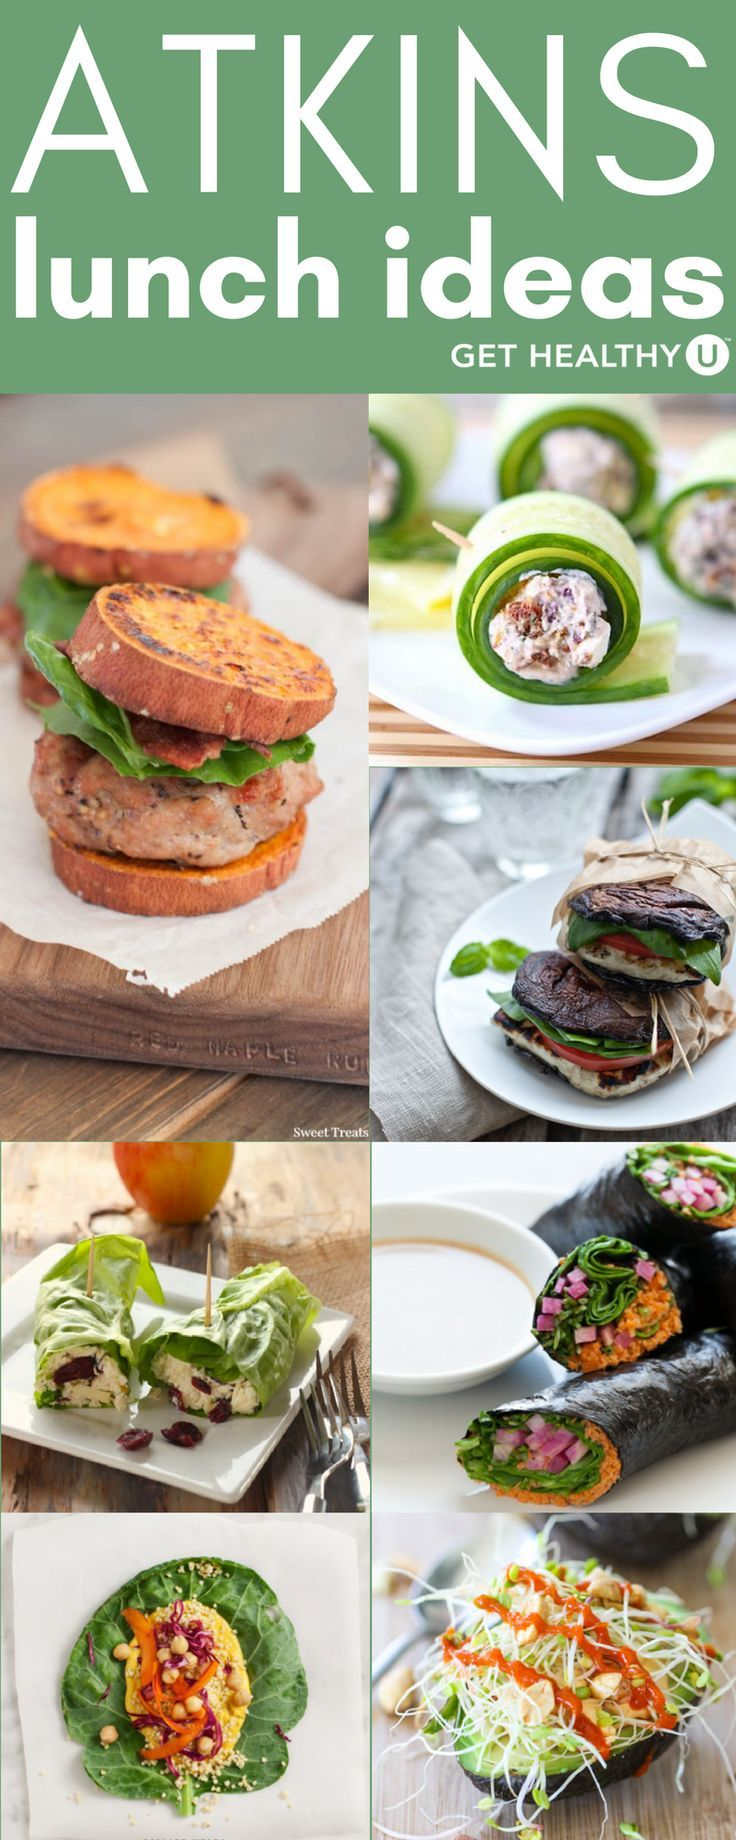 16 breadless sandwich substitutions get healthy u atkins diet